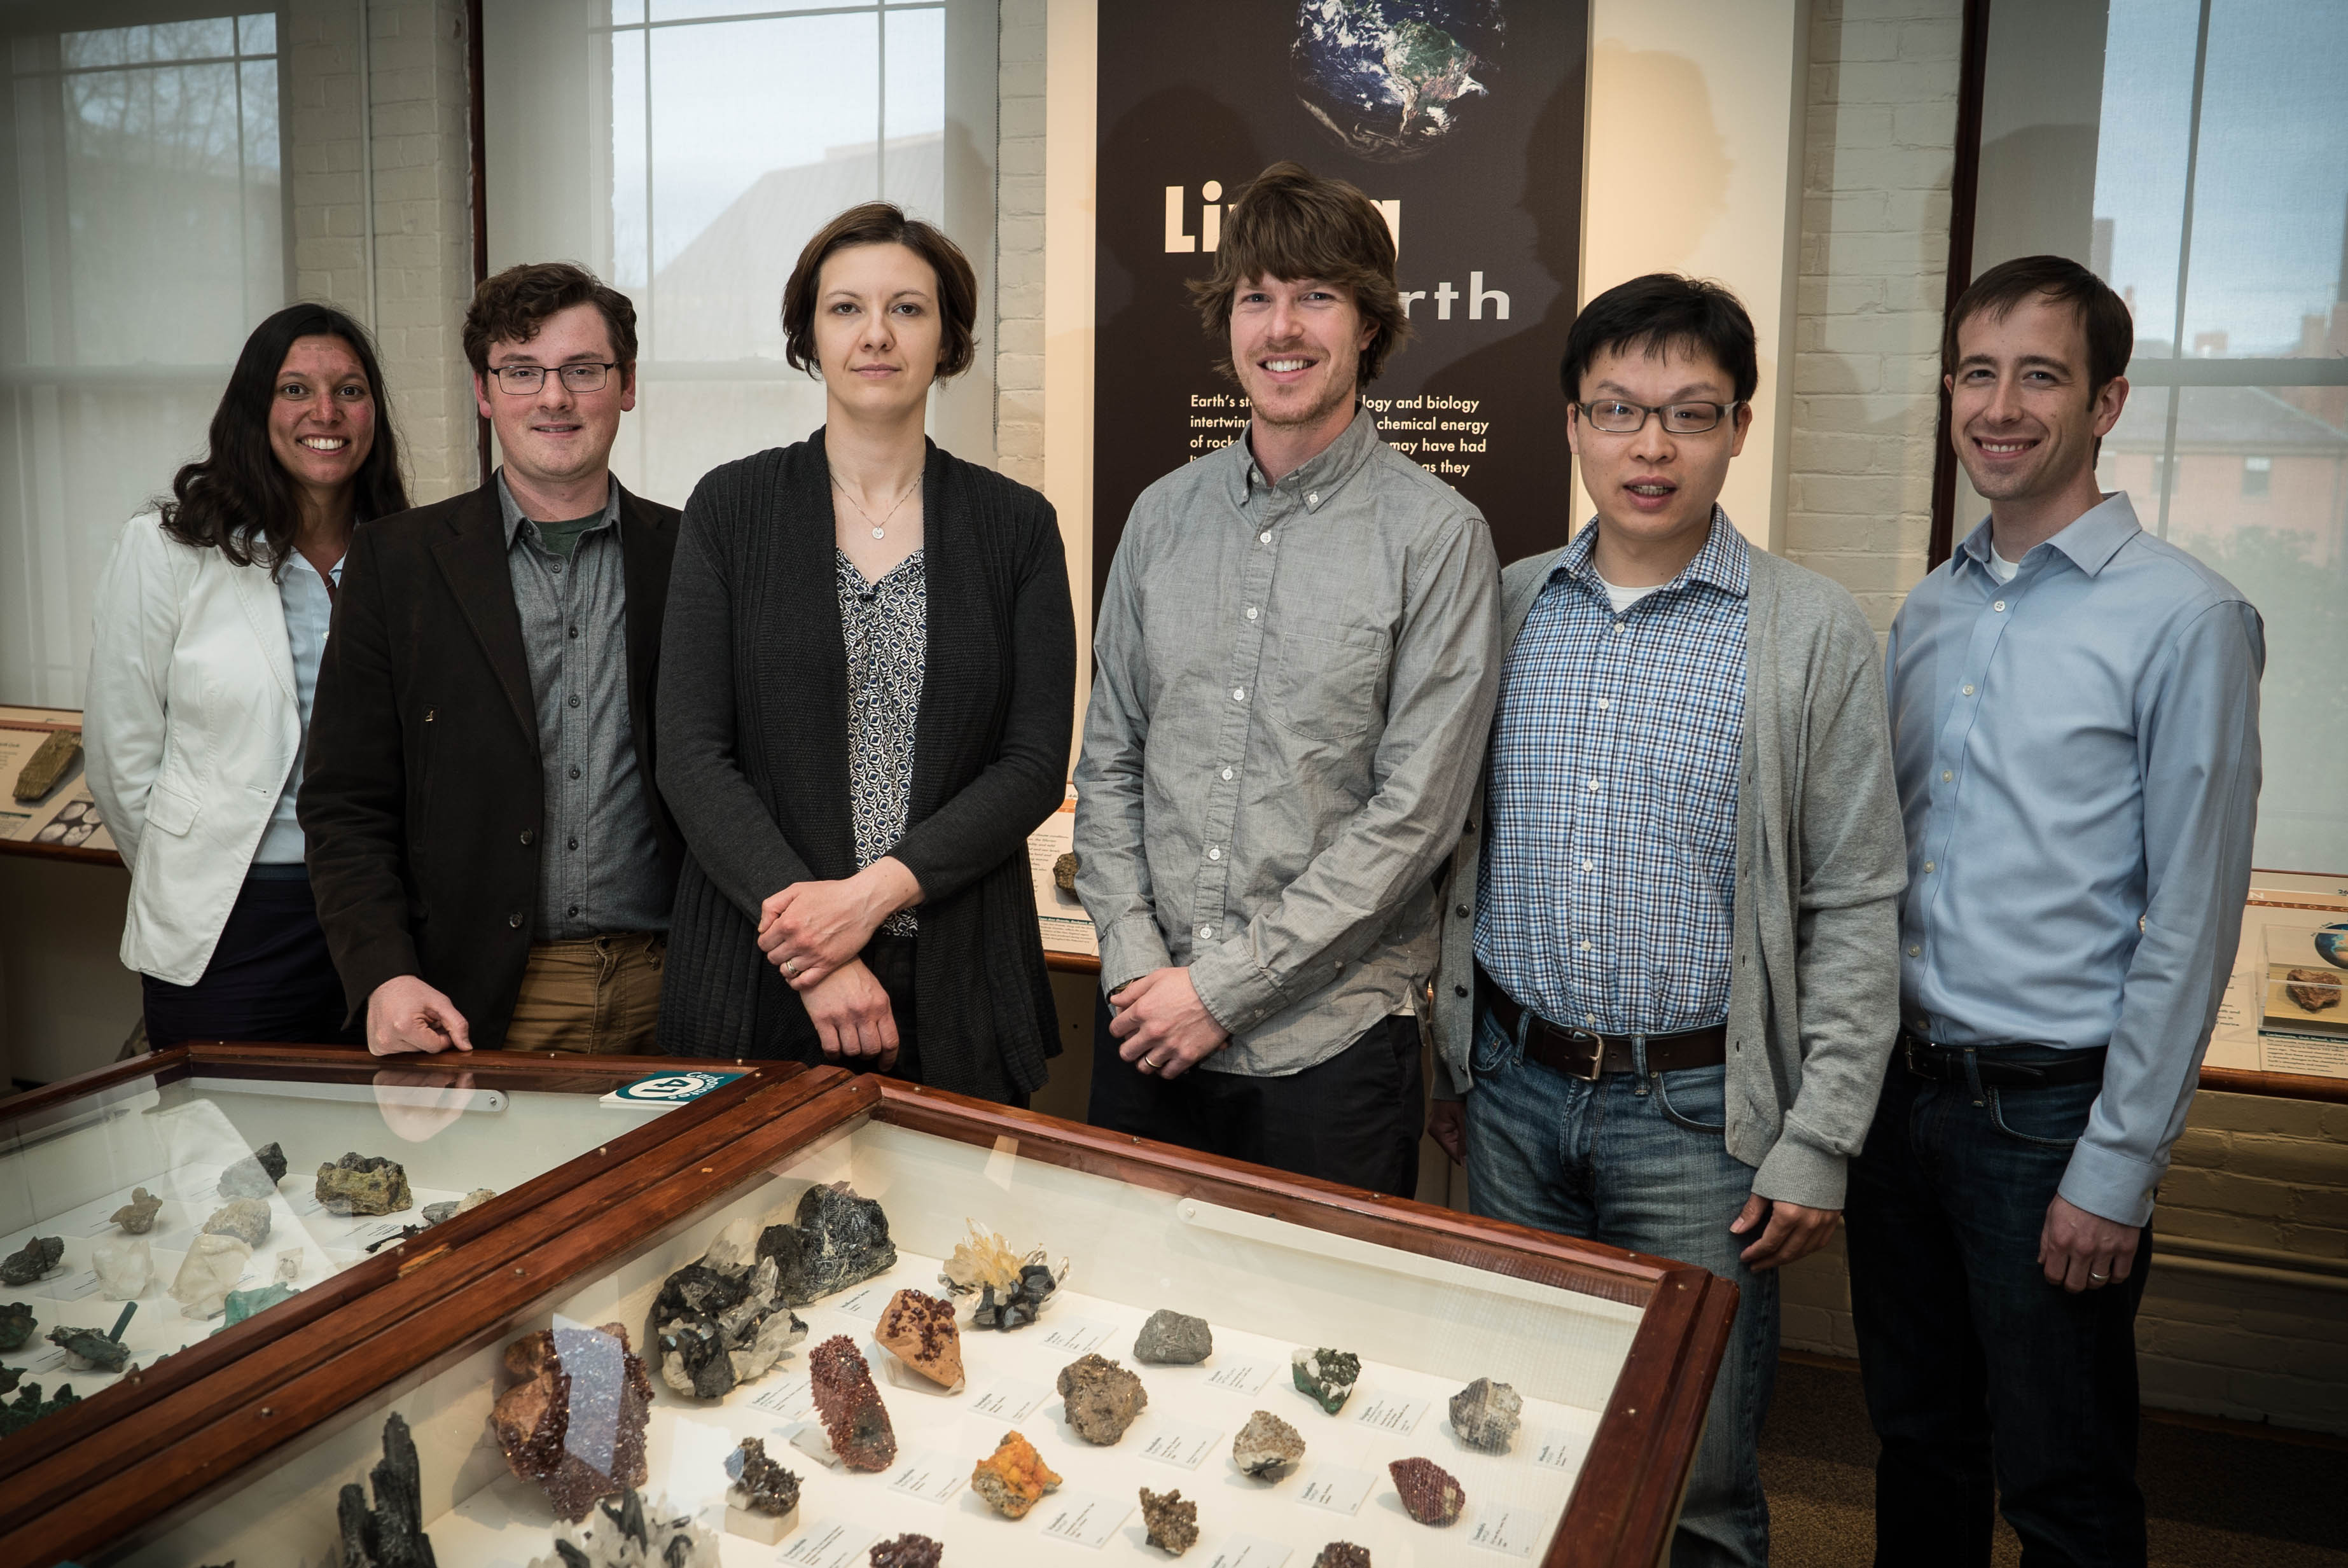 Harvard University Environmental Fellows Program 2018 (Salary of $66,000/year)